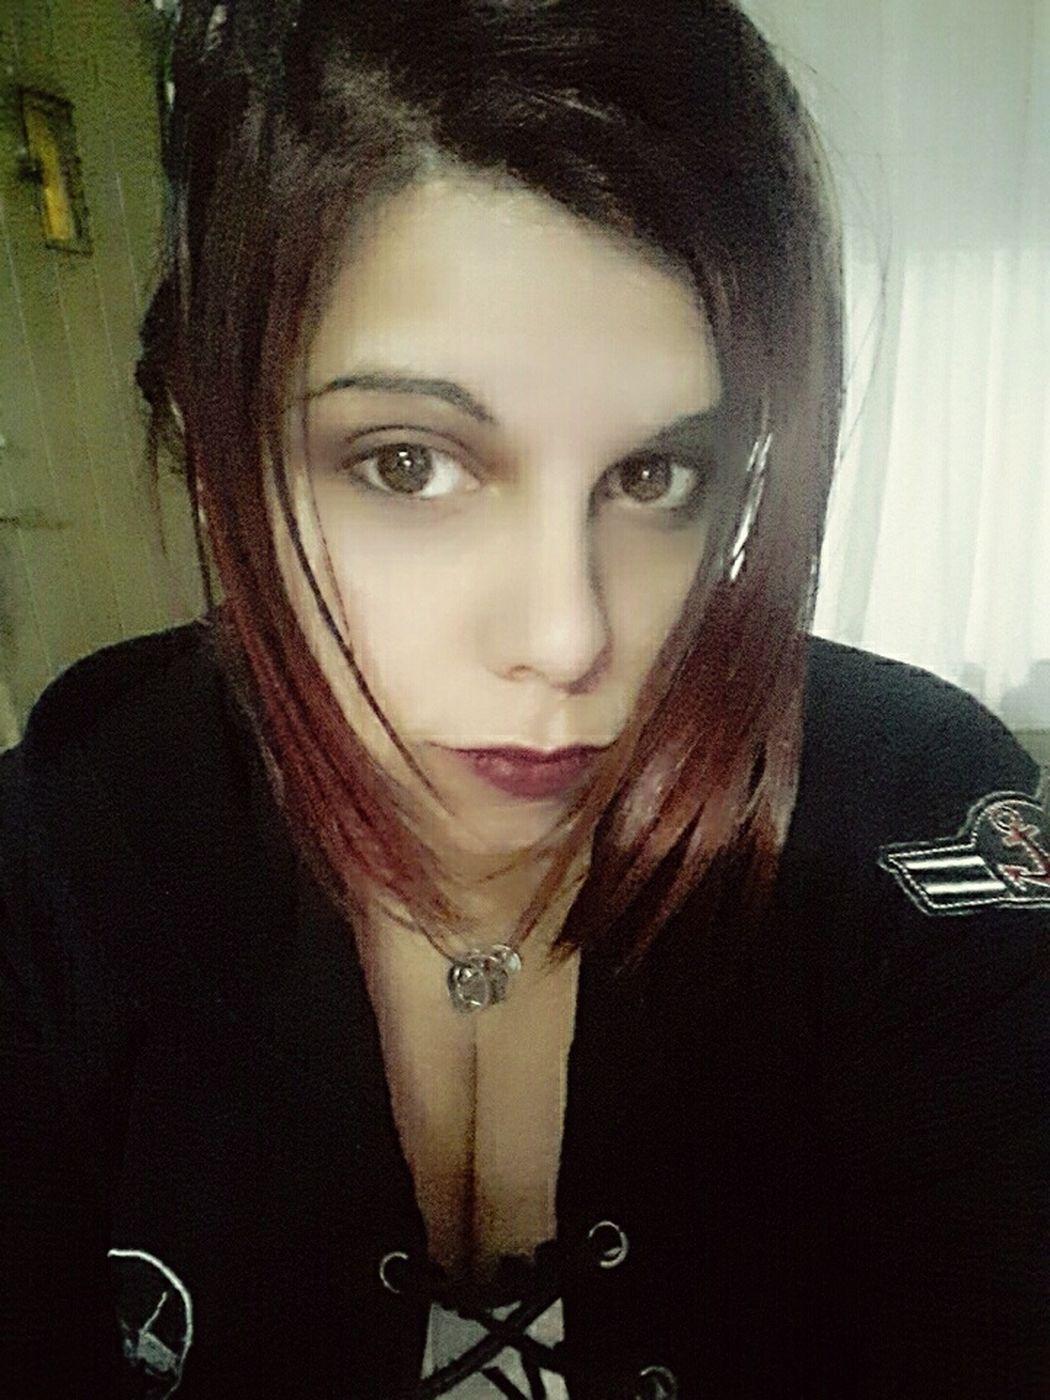 Novice Firstphotos Vintage Photo Vintage Girl Me Redhair Softmakeup Makeup Follow4follow Like4like